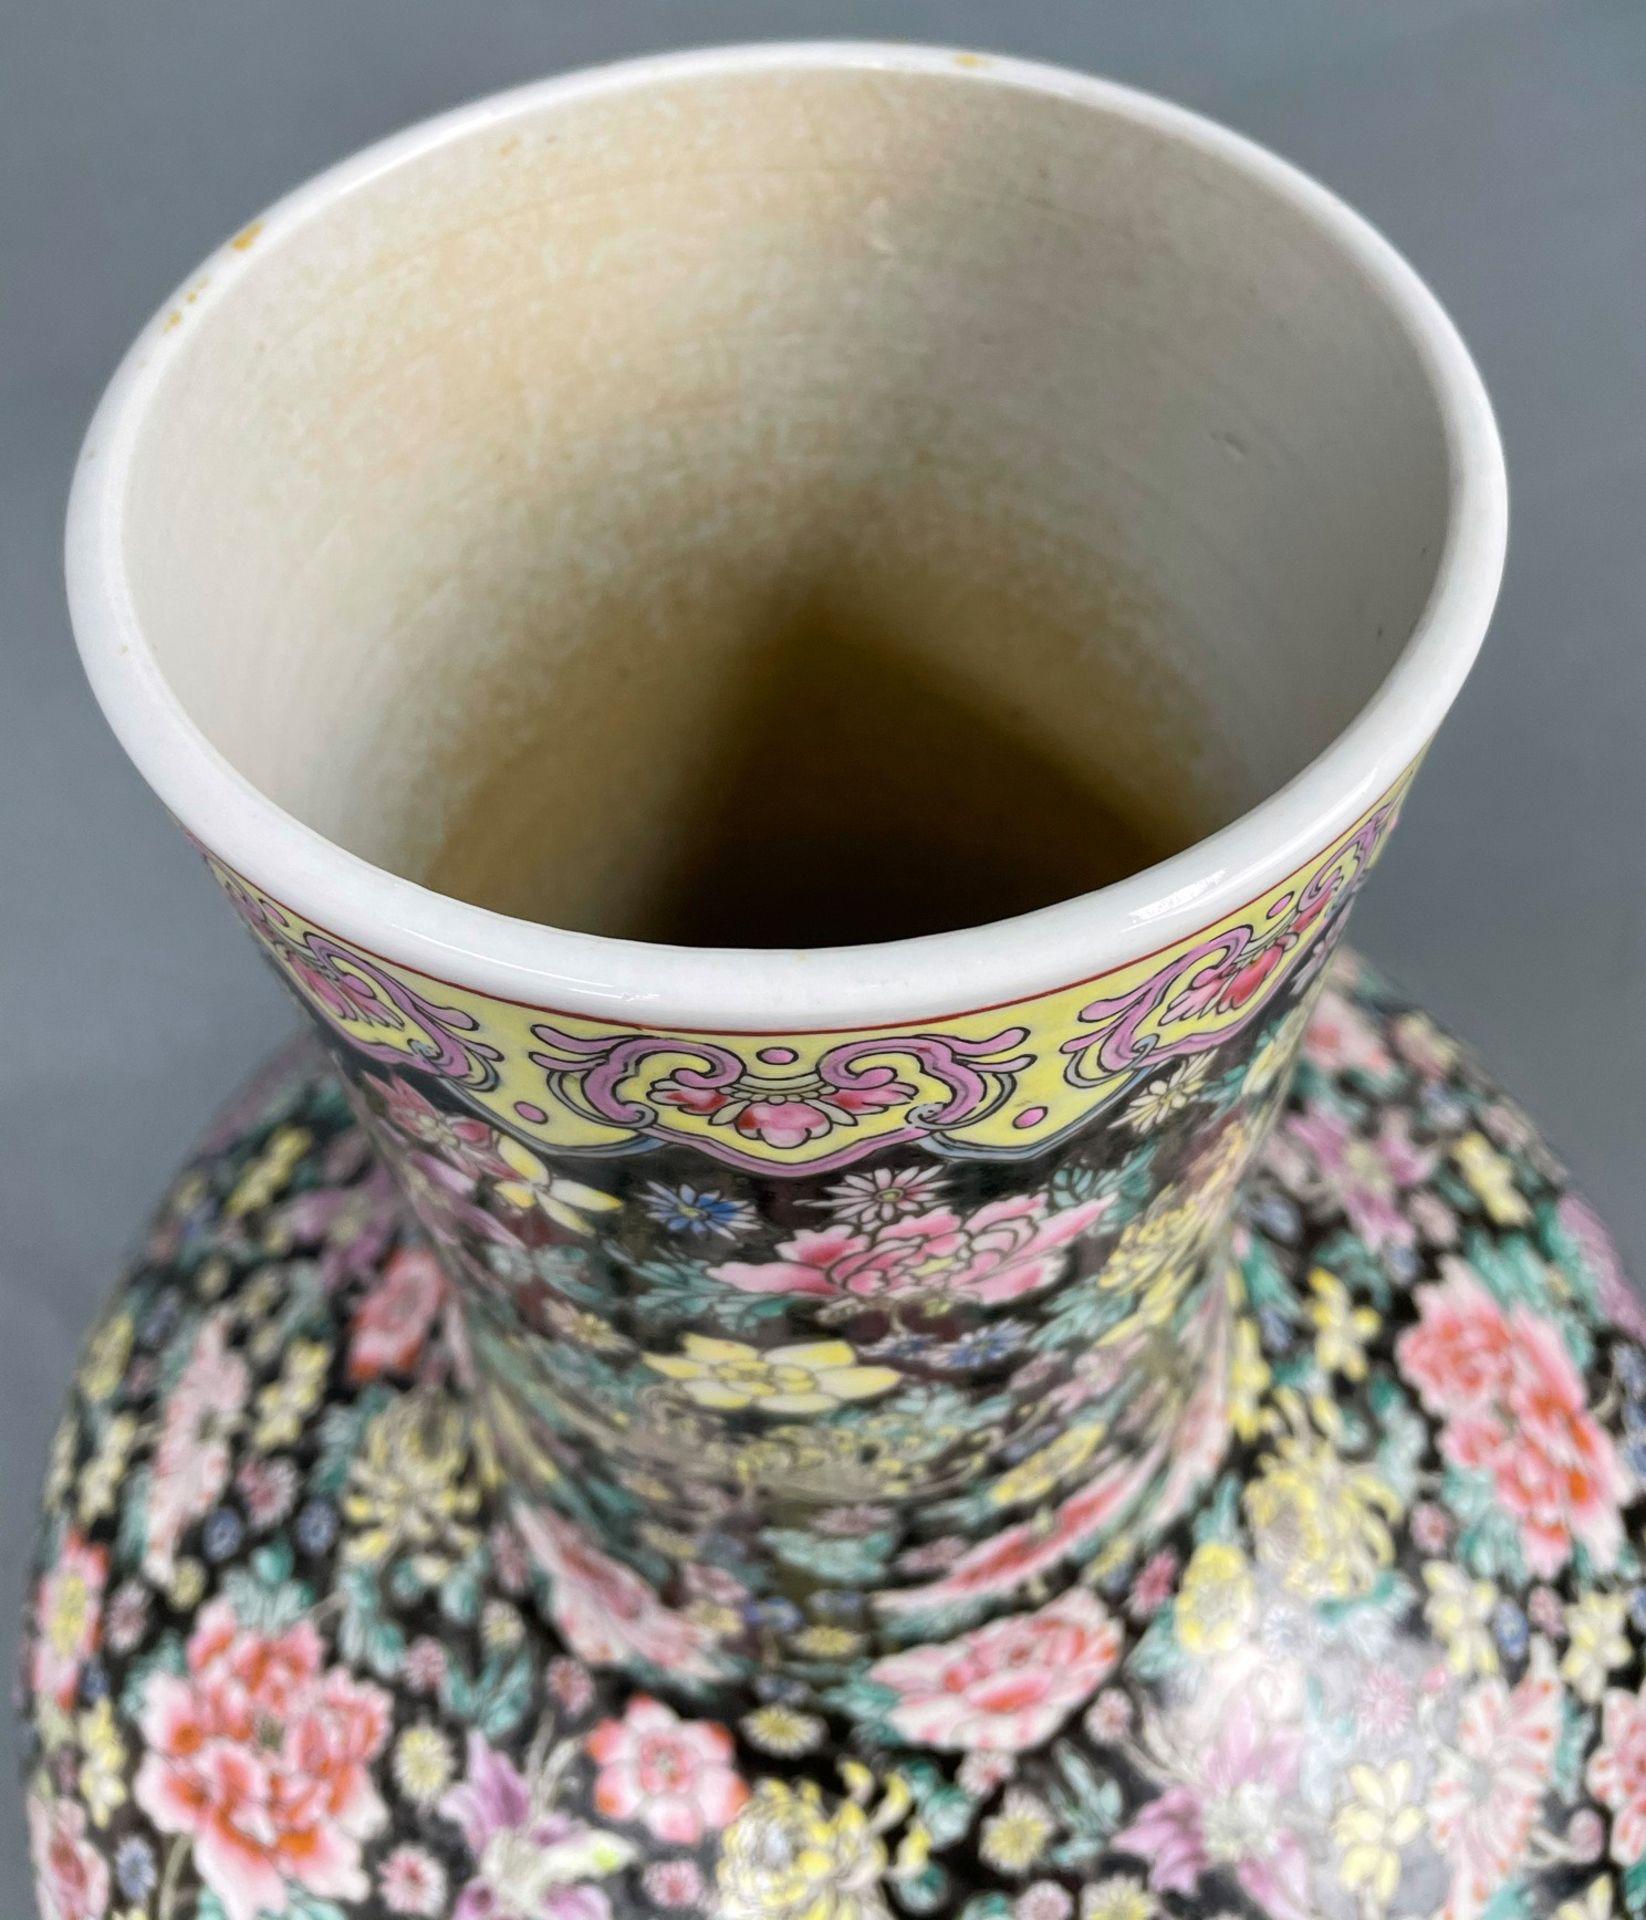 China. Porzellan. Vase. Stempelmarke circa 1930 - 1950. 53 cm hoch. - Image 13 of 20